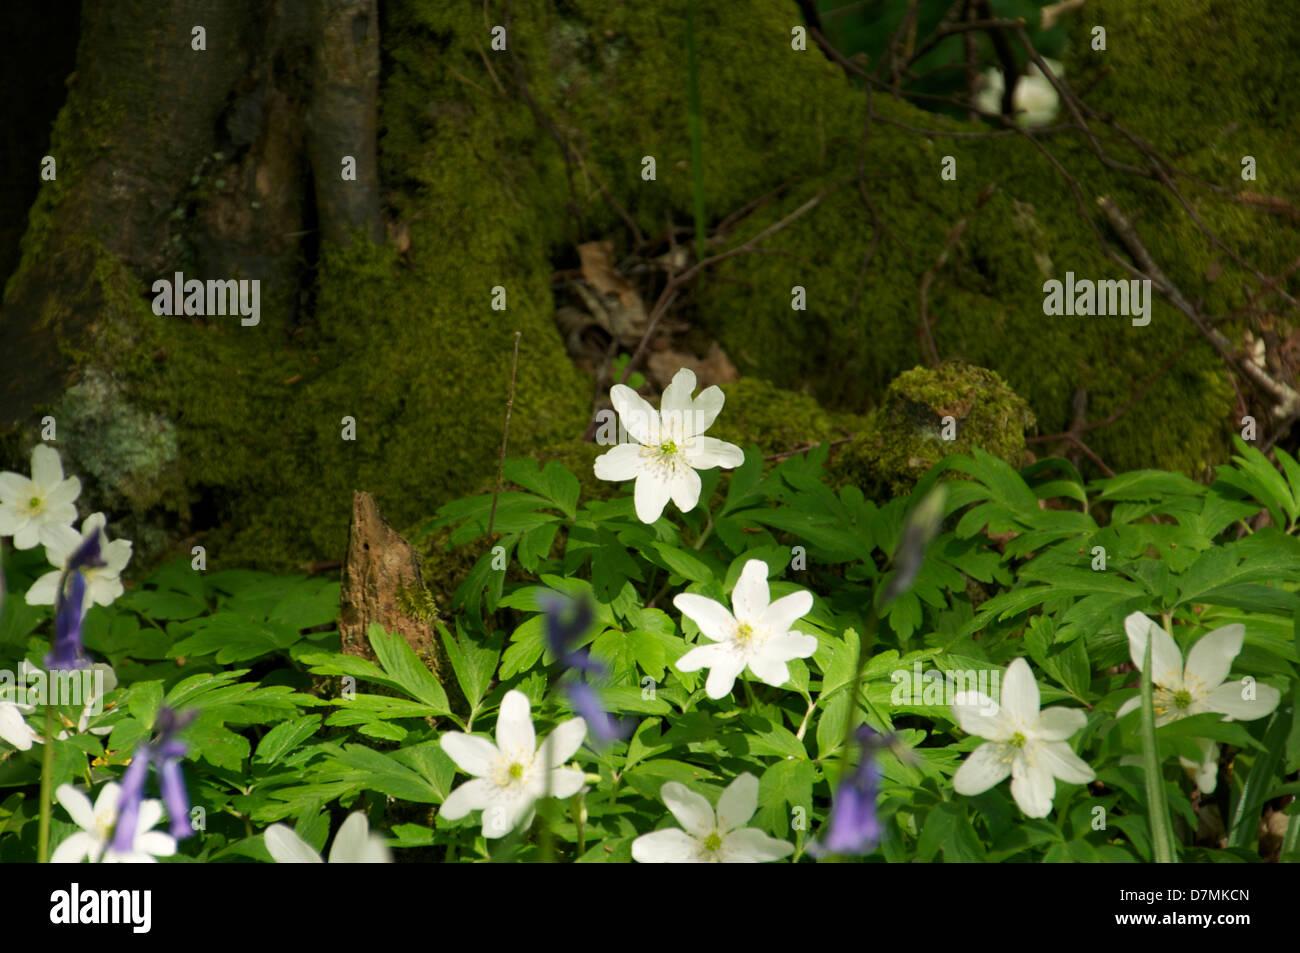 Bluebells Anemone Woodland Sussex Walk Moss On Log Shadows White